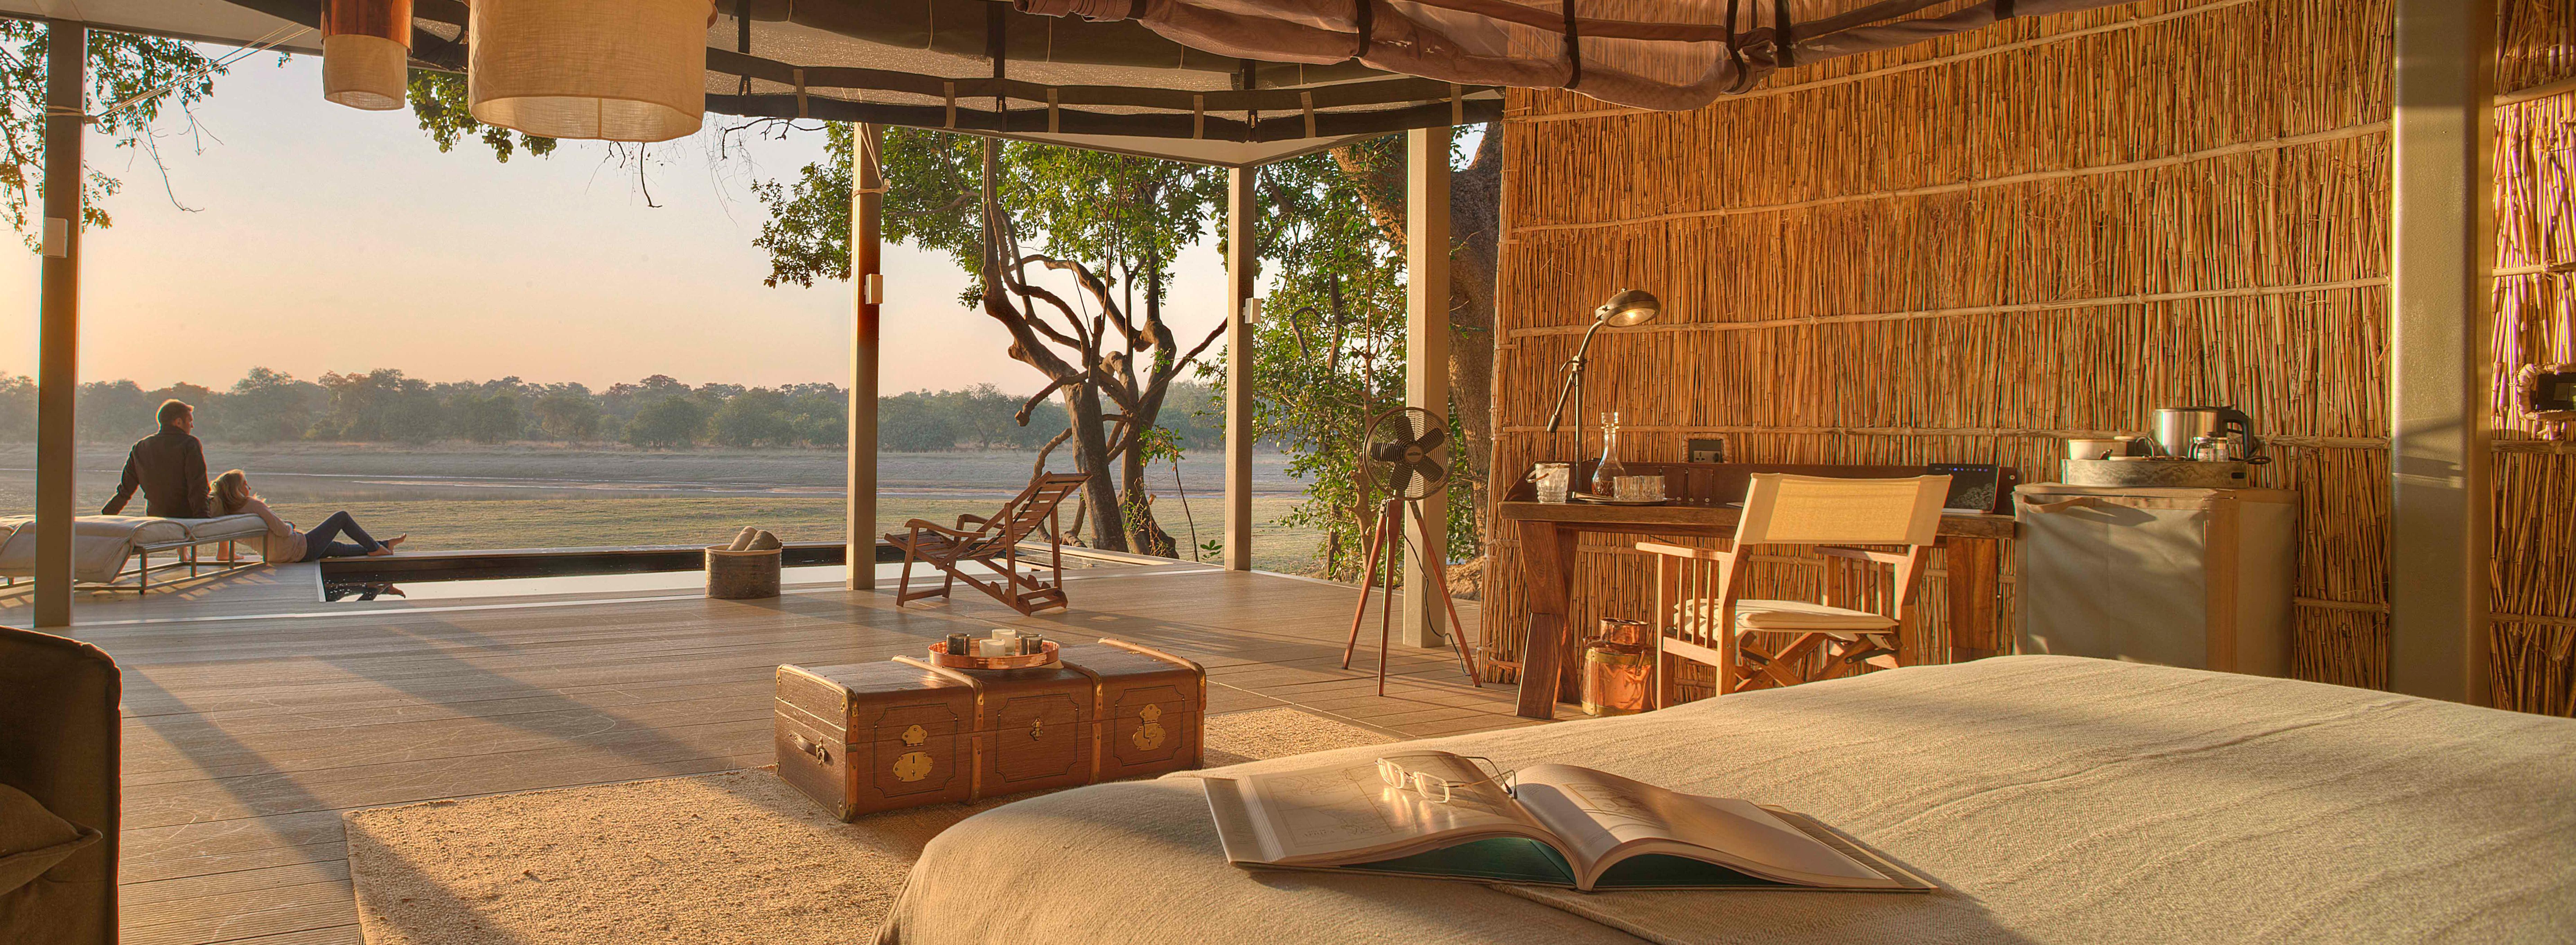 luangwa-valley-luxury-safari-lodge